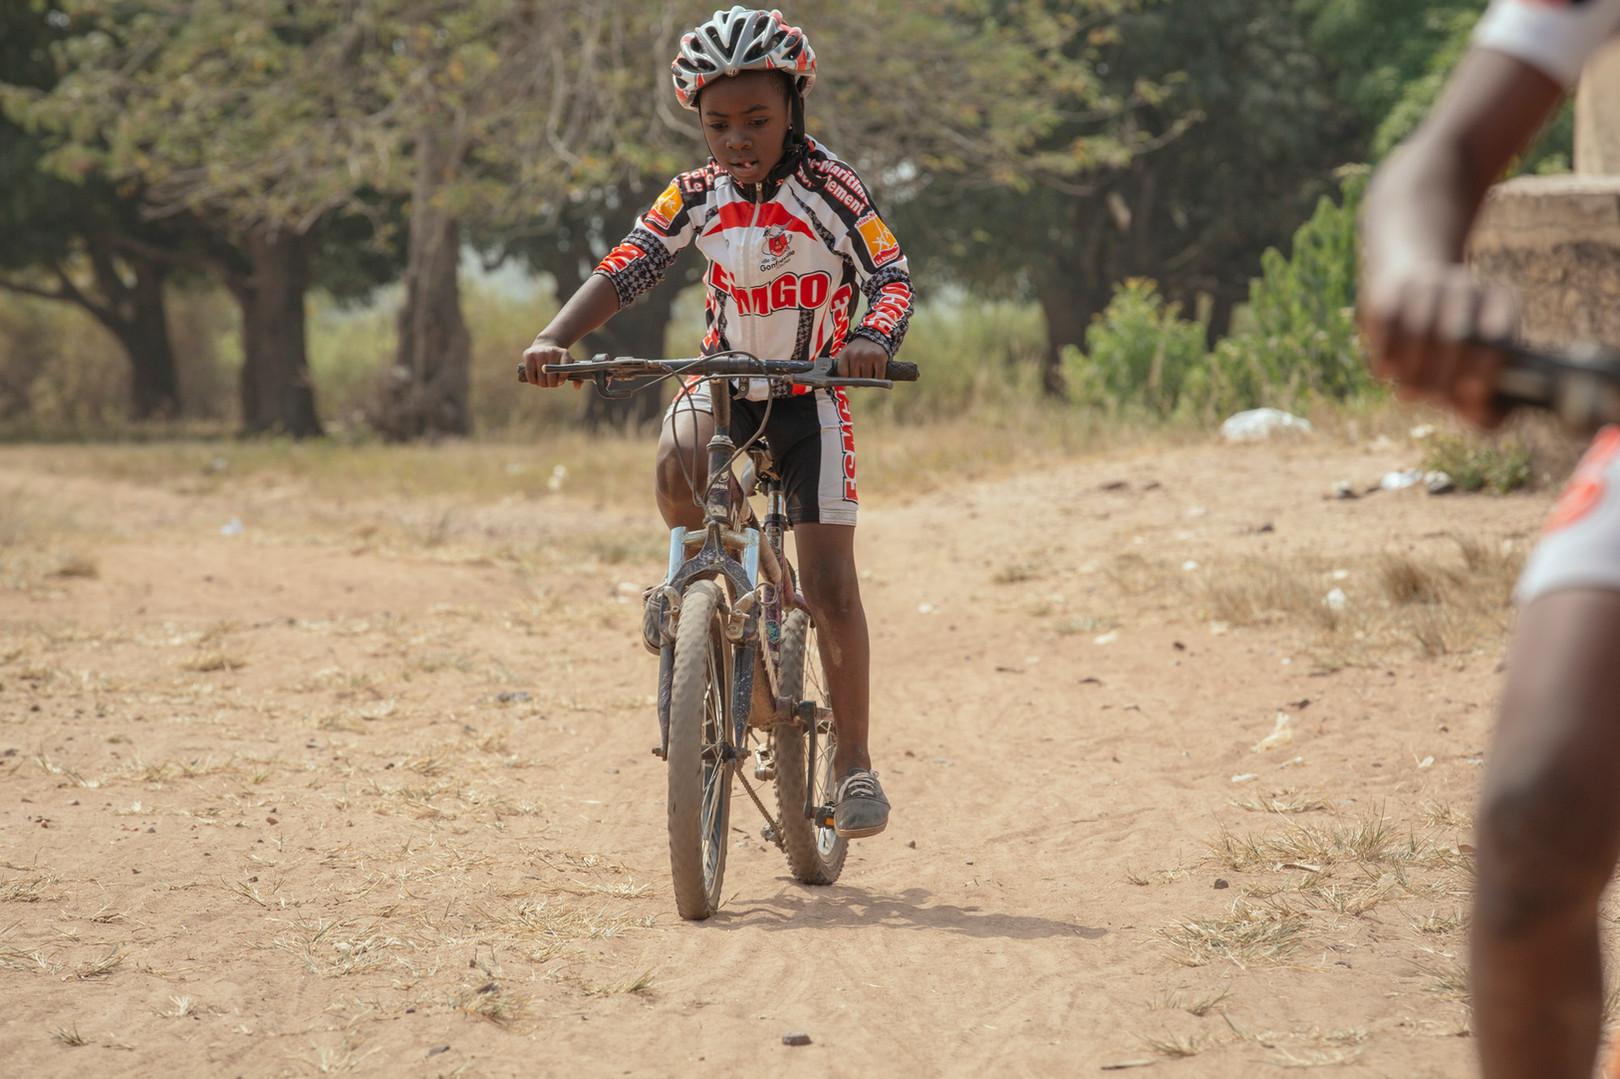 0078_Togo_KpaliméCyclingProject_20151220